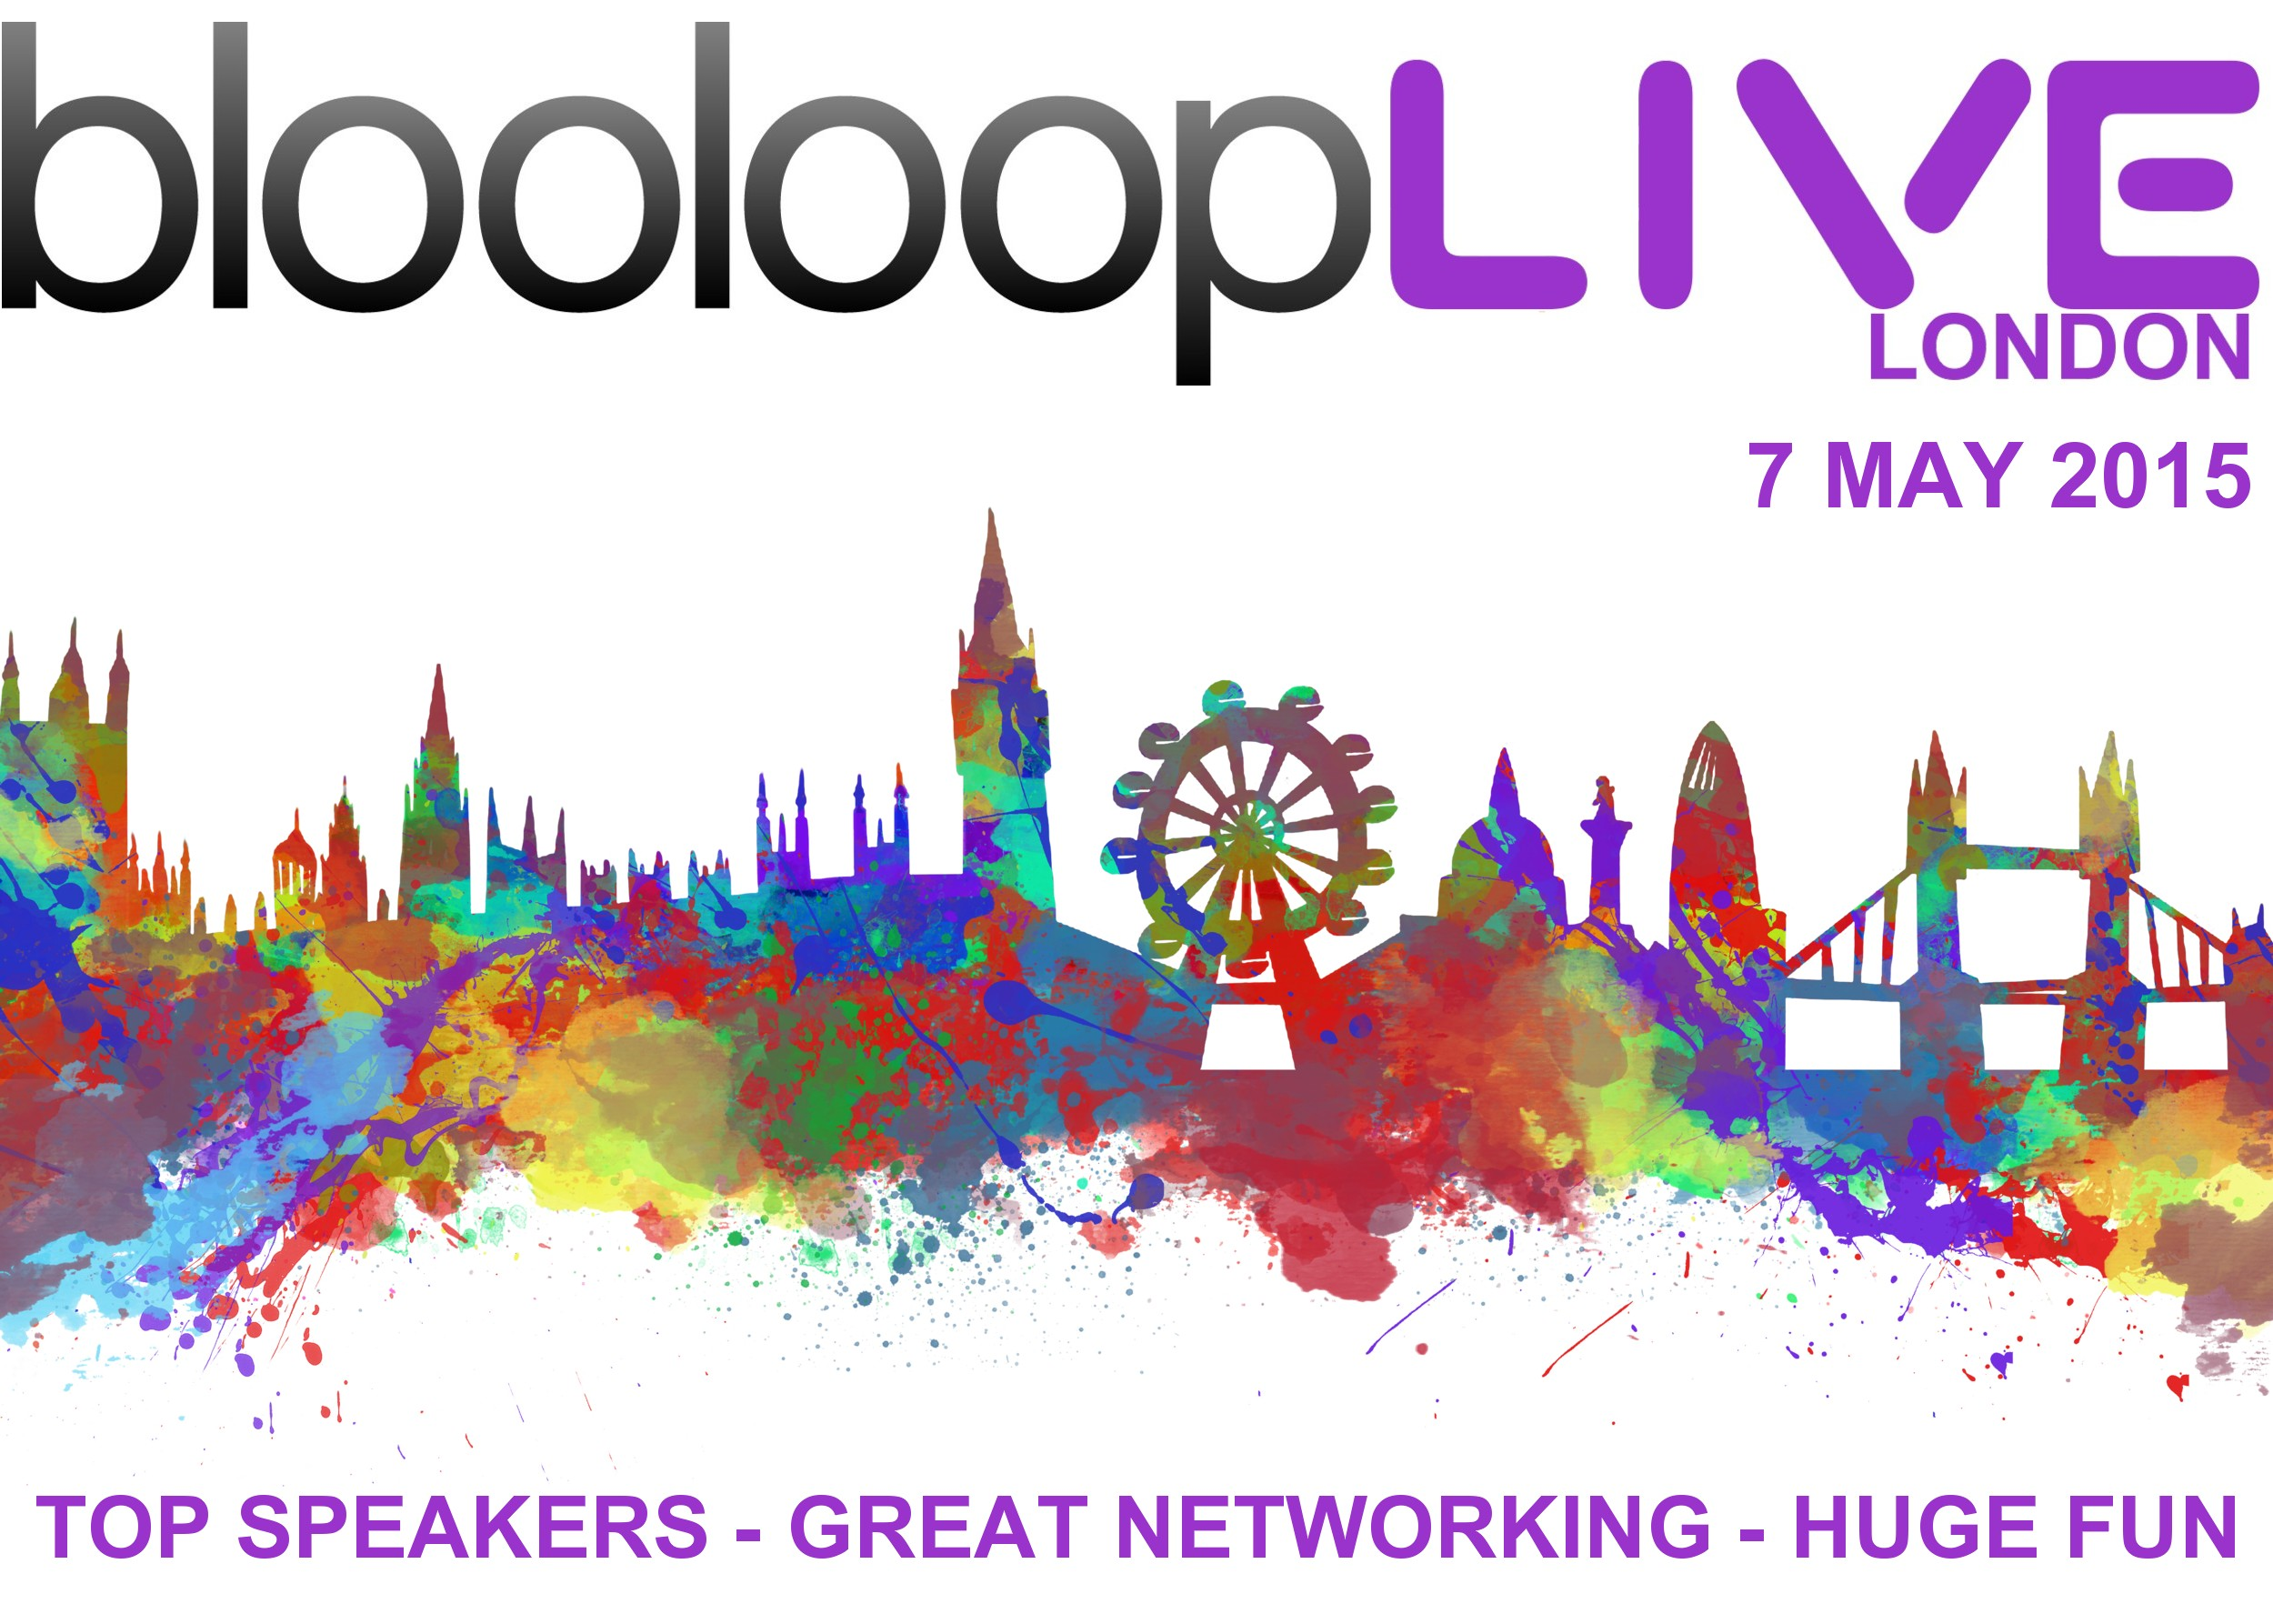 blooloopLIVE London